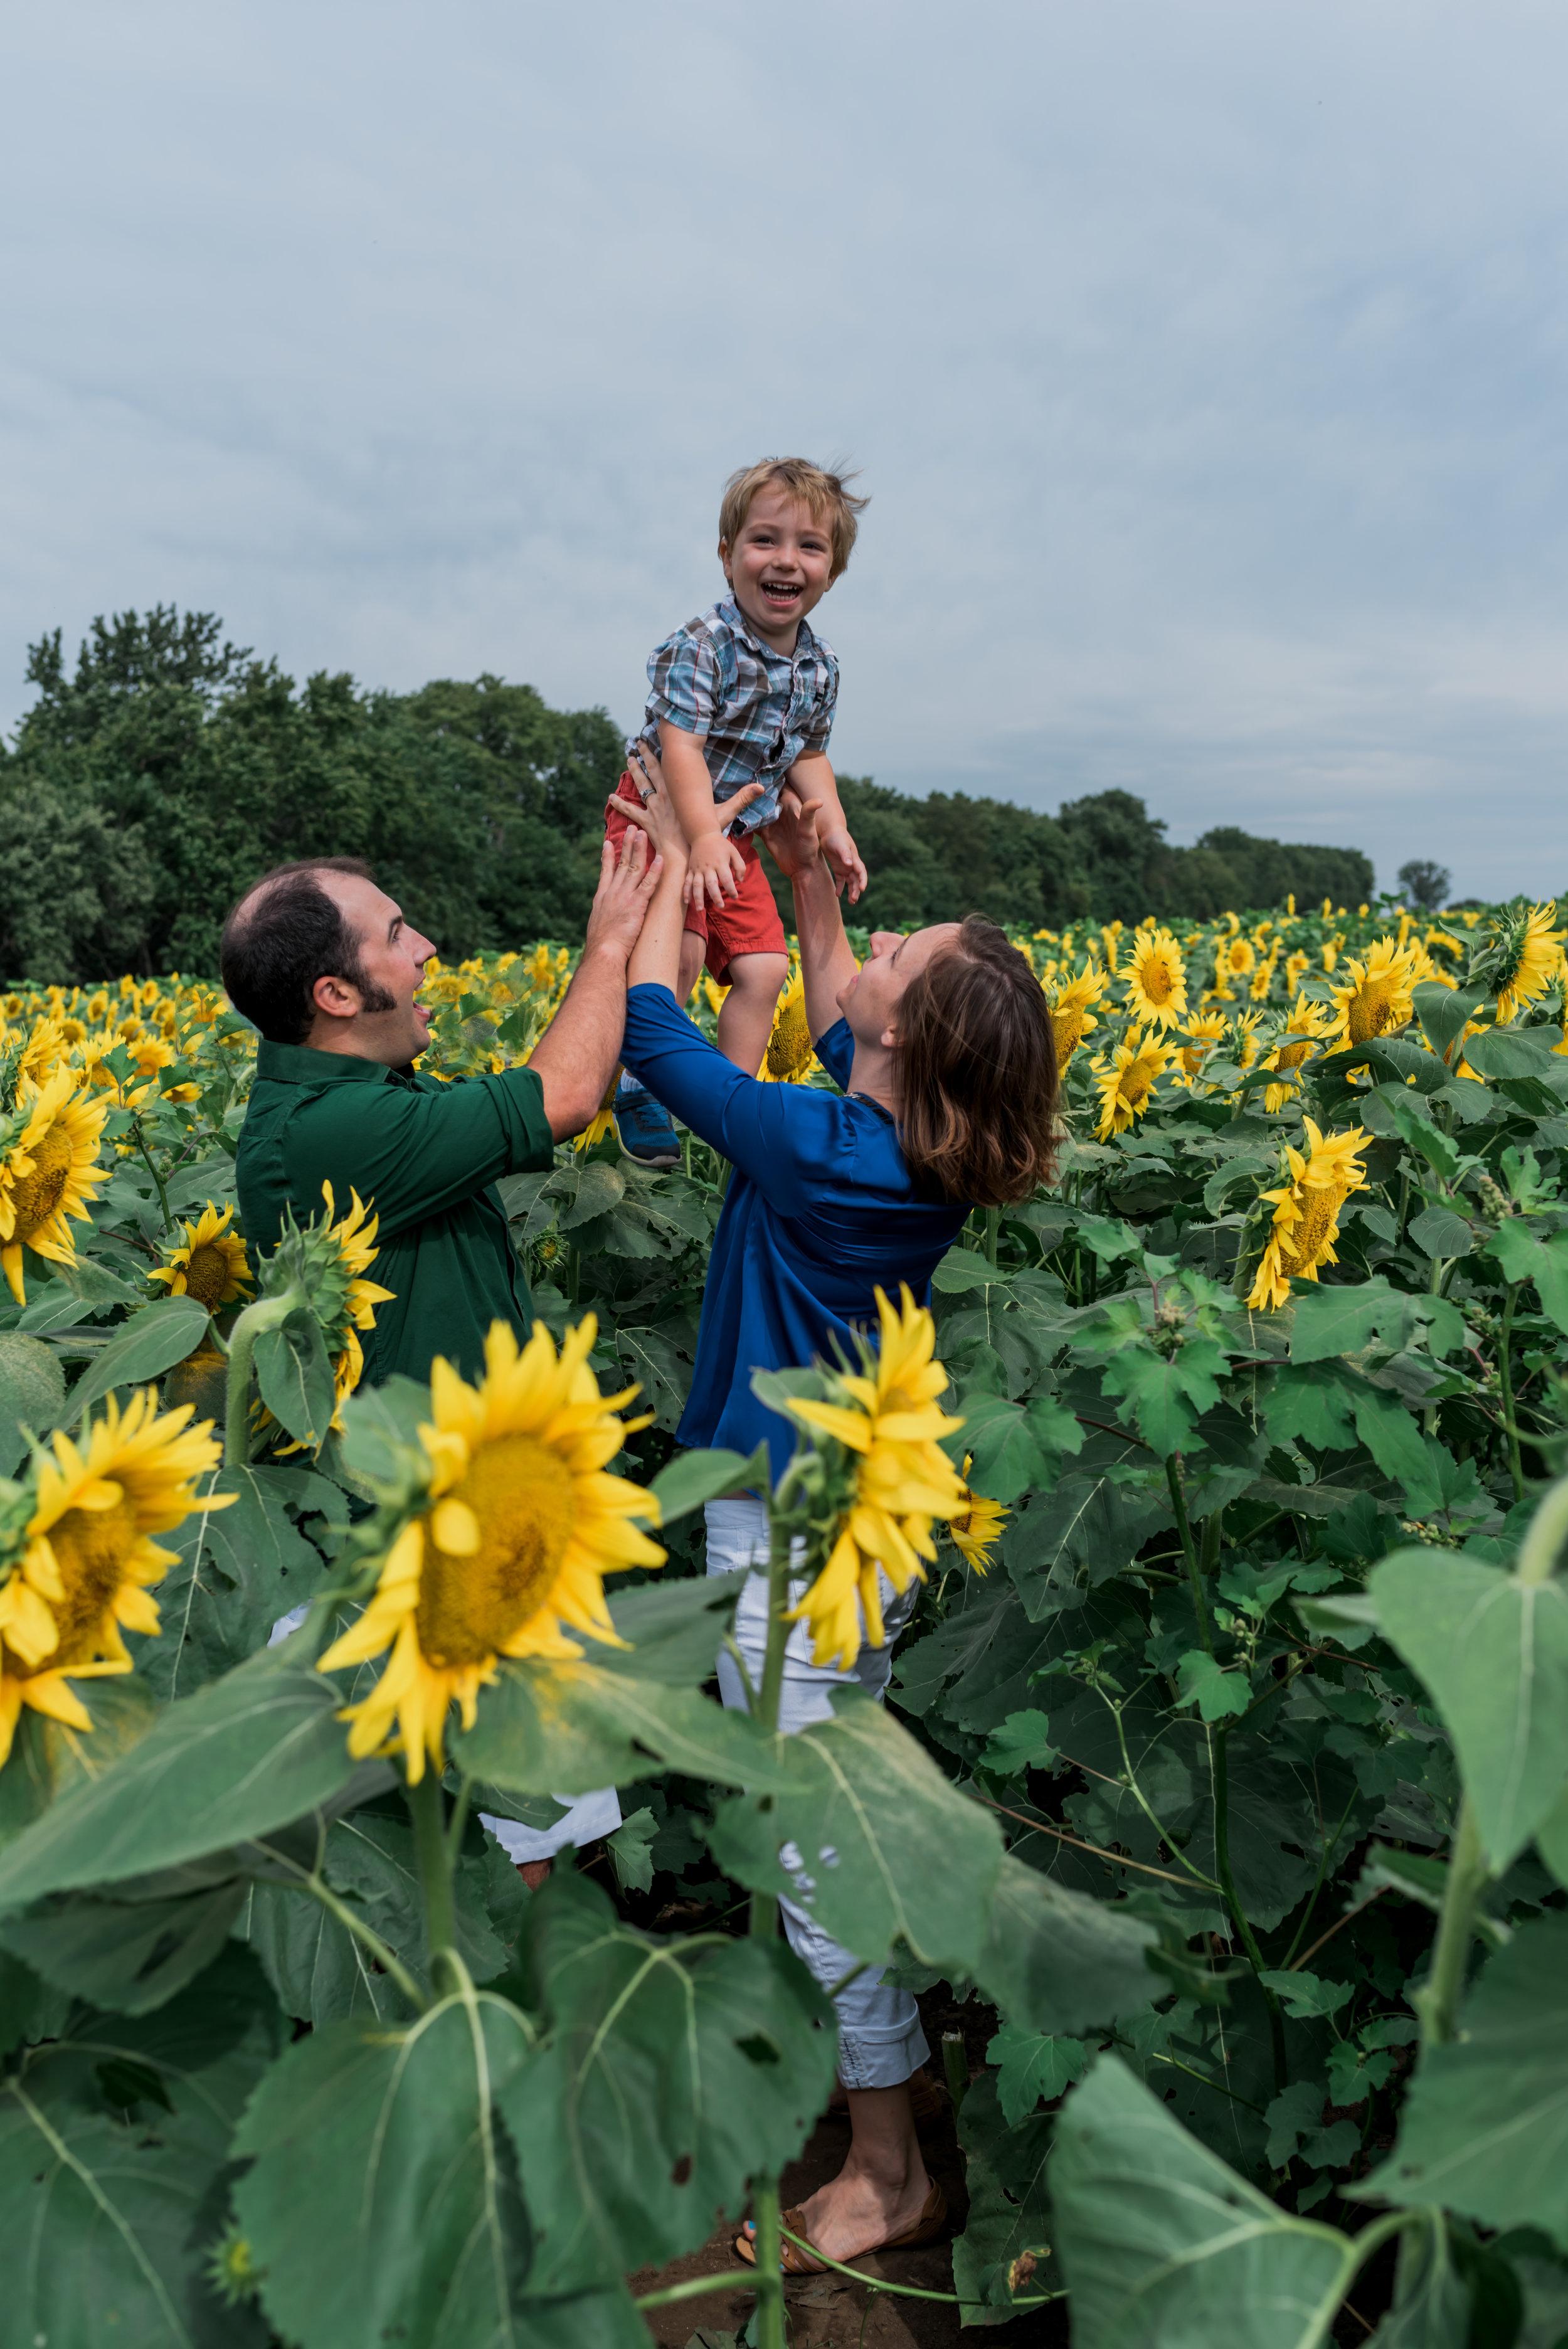 RebeccaLassiterPhotography Grinter Farms Olsen Family